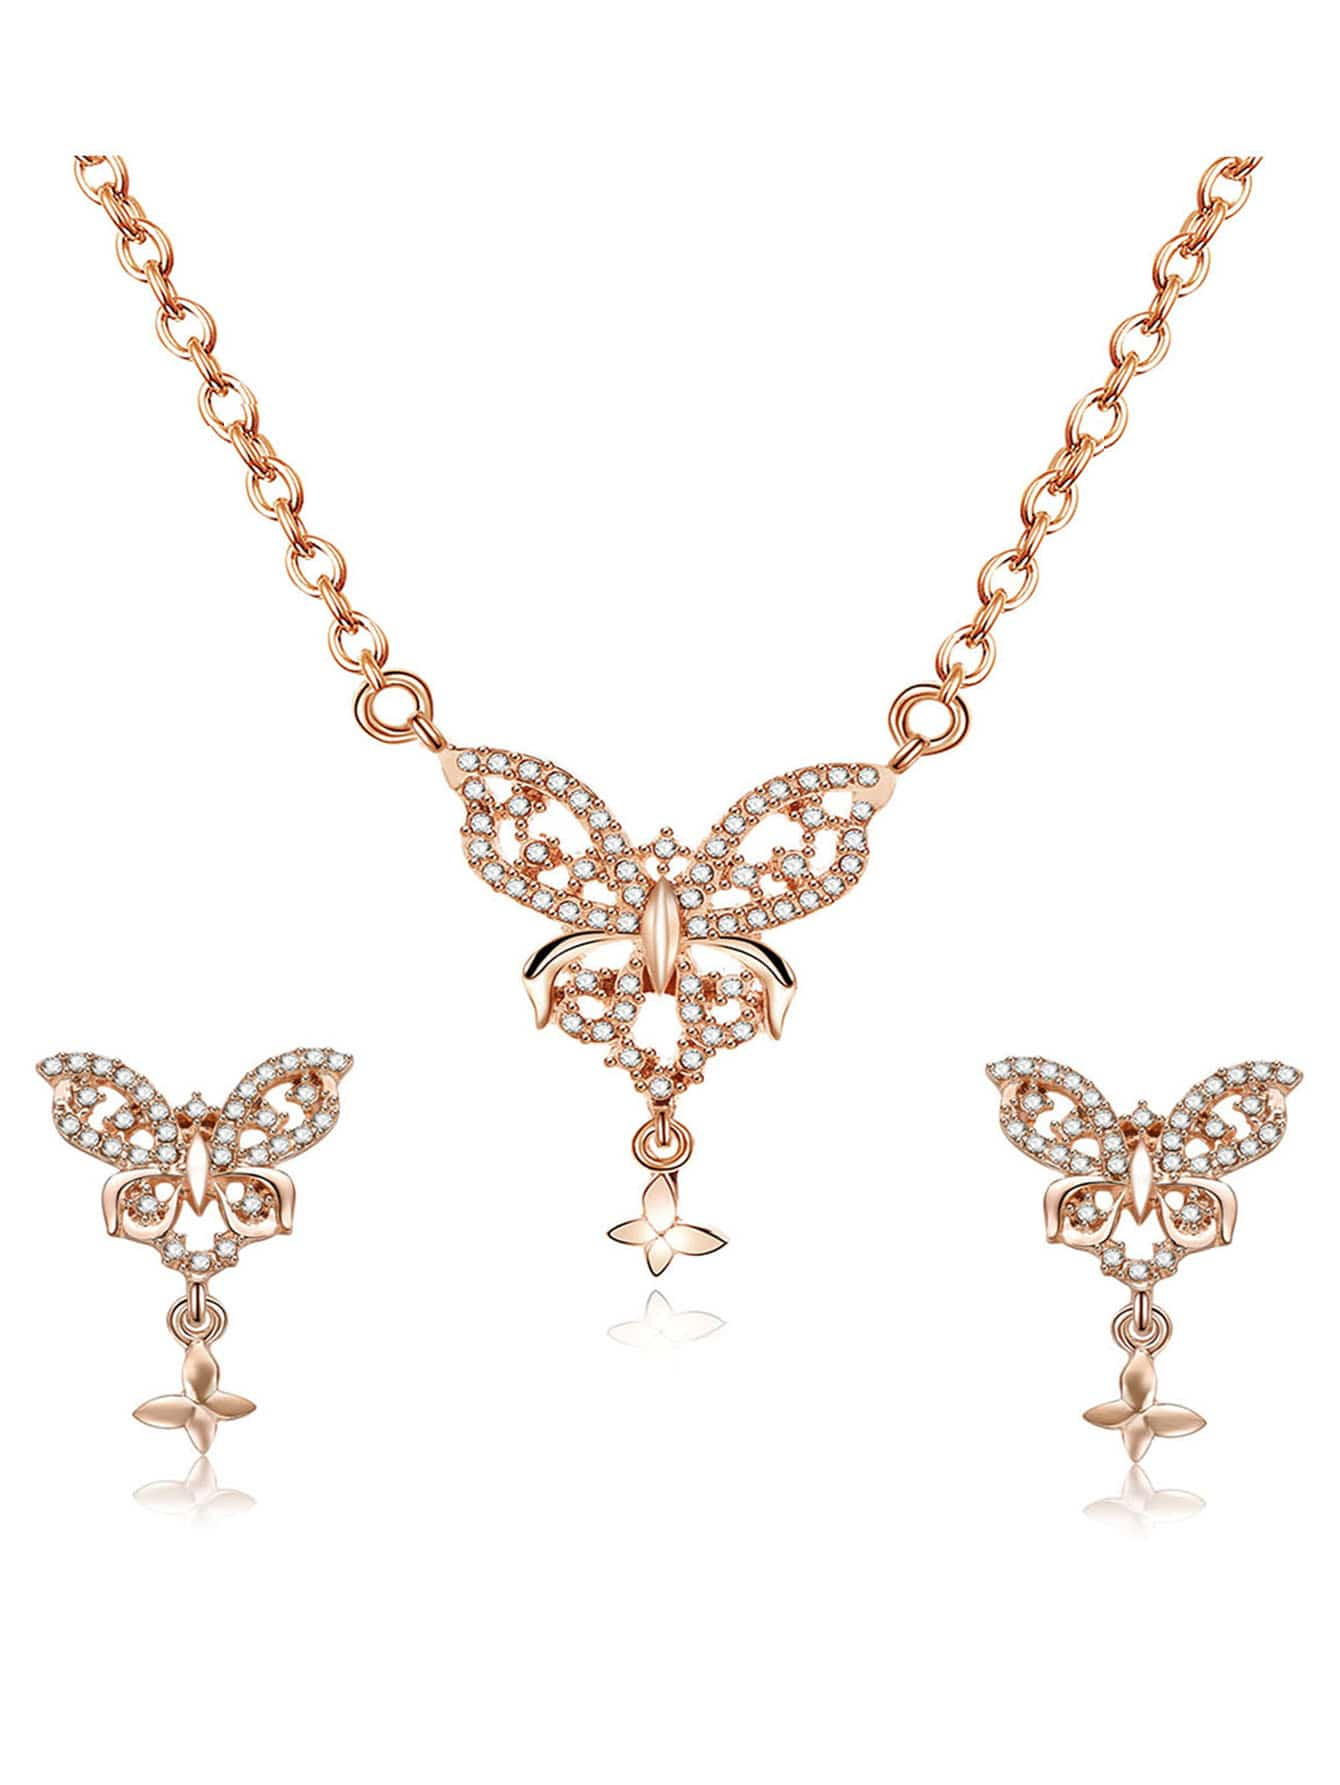 Schmetterling Anhänger Halskette & Ohrringe